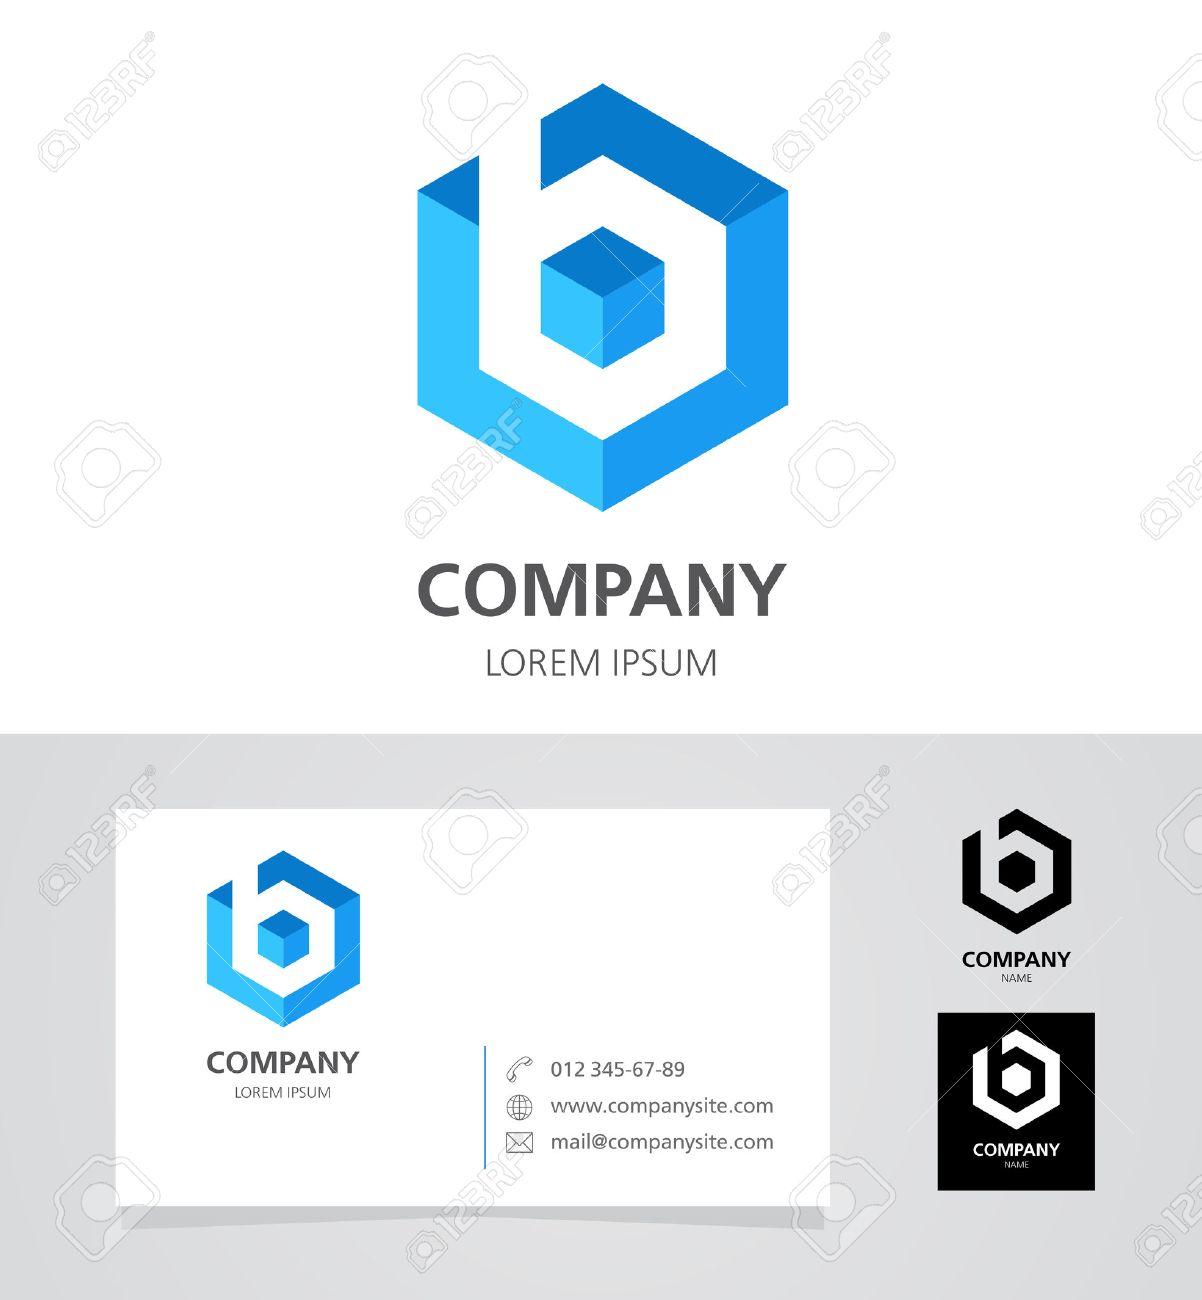 Letter B - Logo Design Element with Business Card - illustration - 61826094